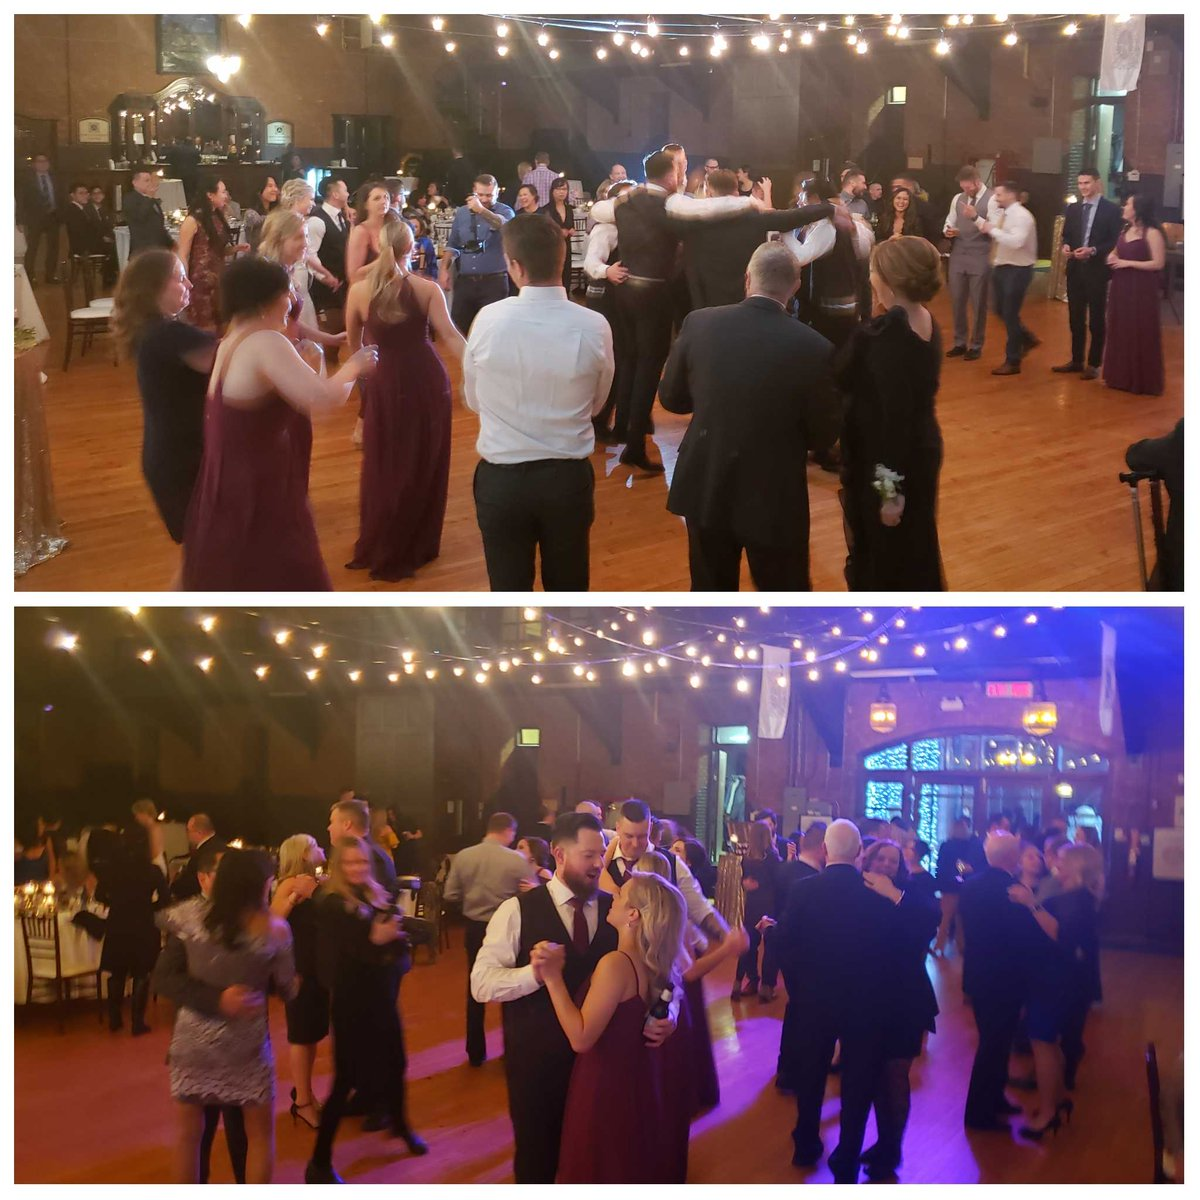 Kelsey & Derek's family and friends know how to party! :) . . . . . #onceuponatruong #justgrinproductions #reception #dance #party #wedding #coordination #weddingcoordinator #cassiesavestheday #mobiledj #weddingdj #djwaylan